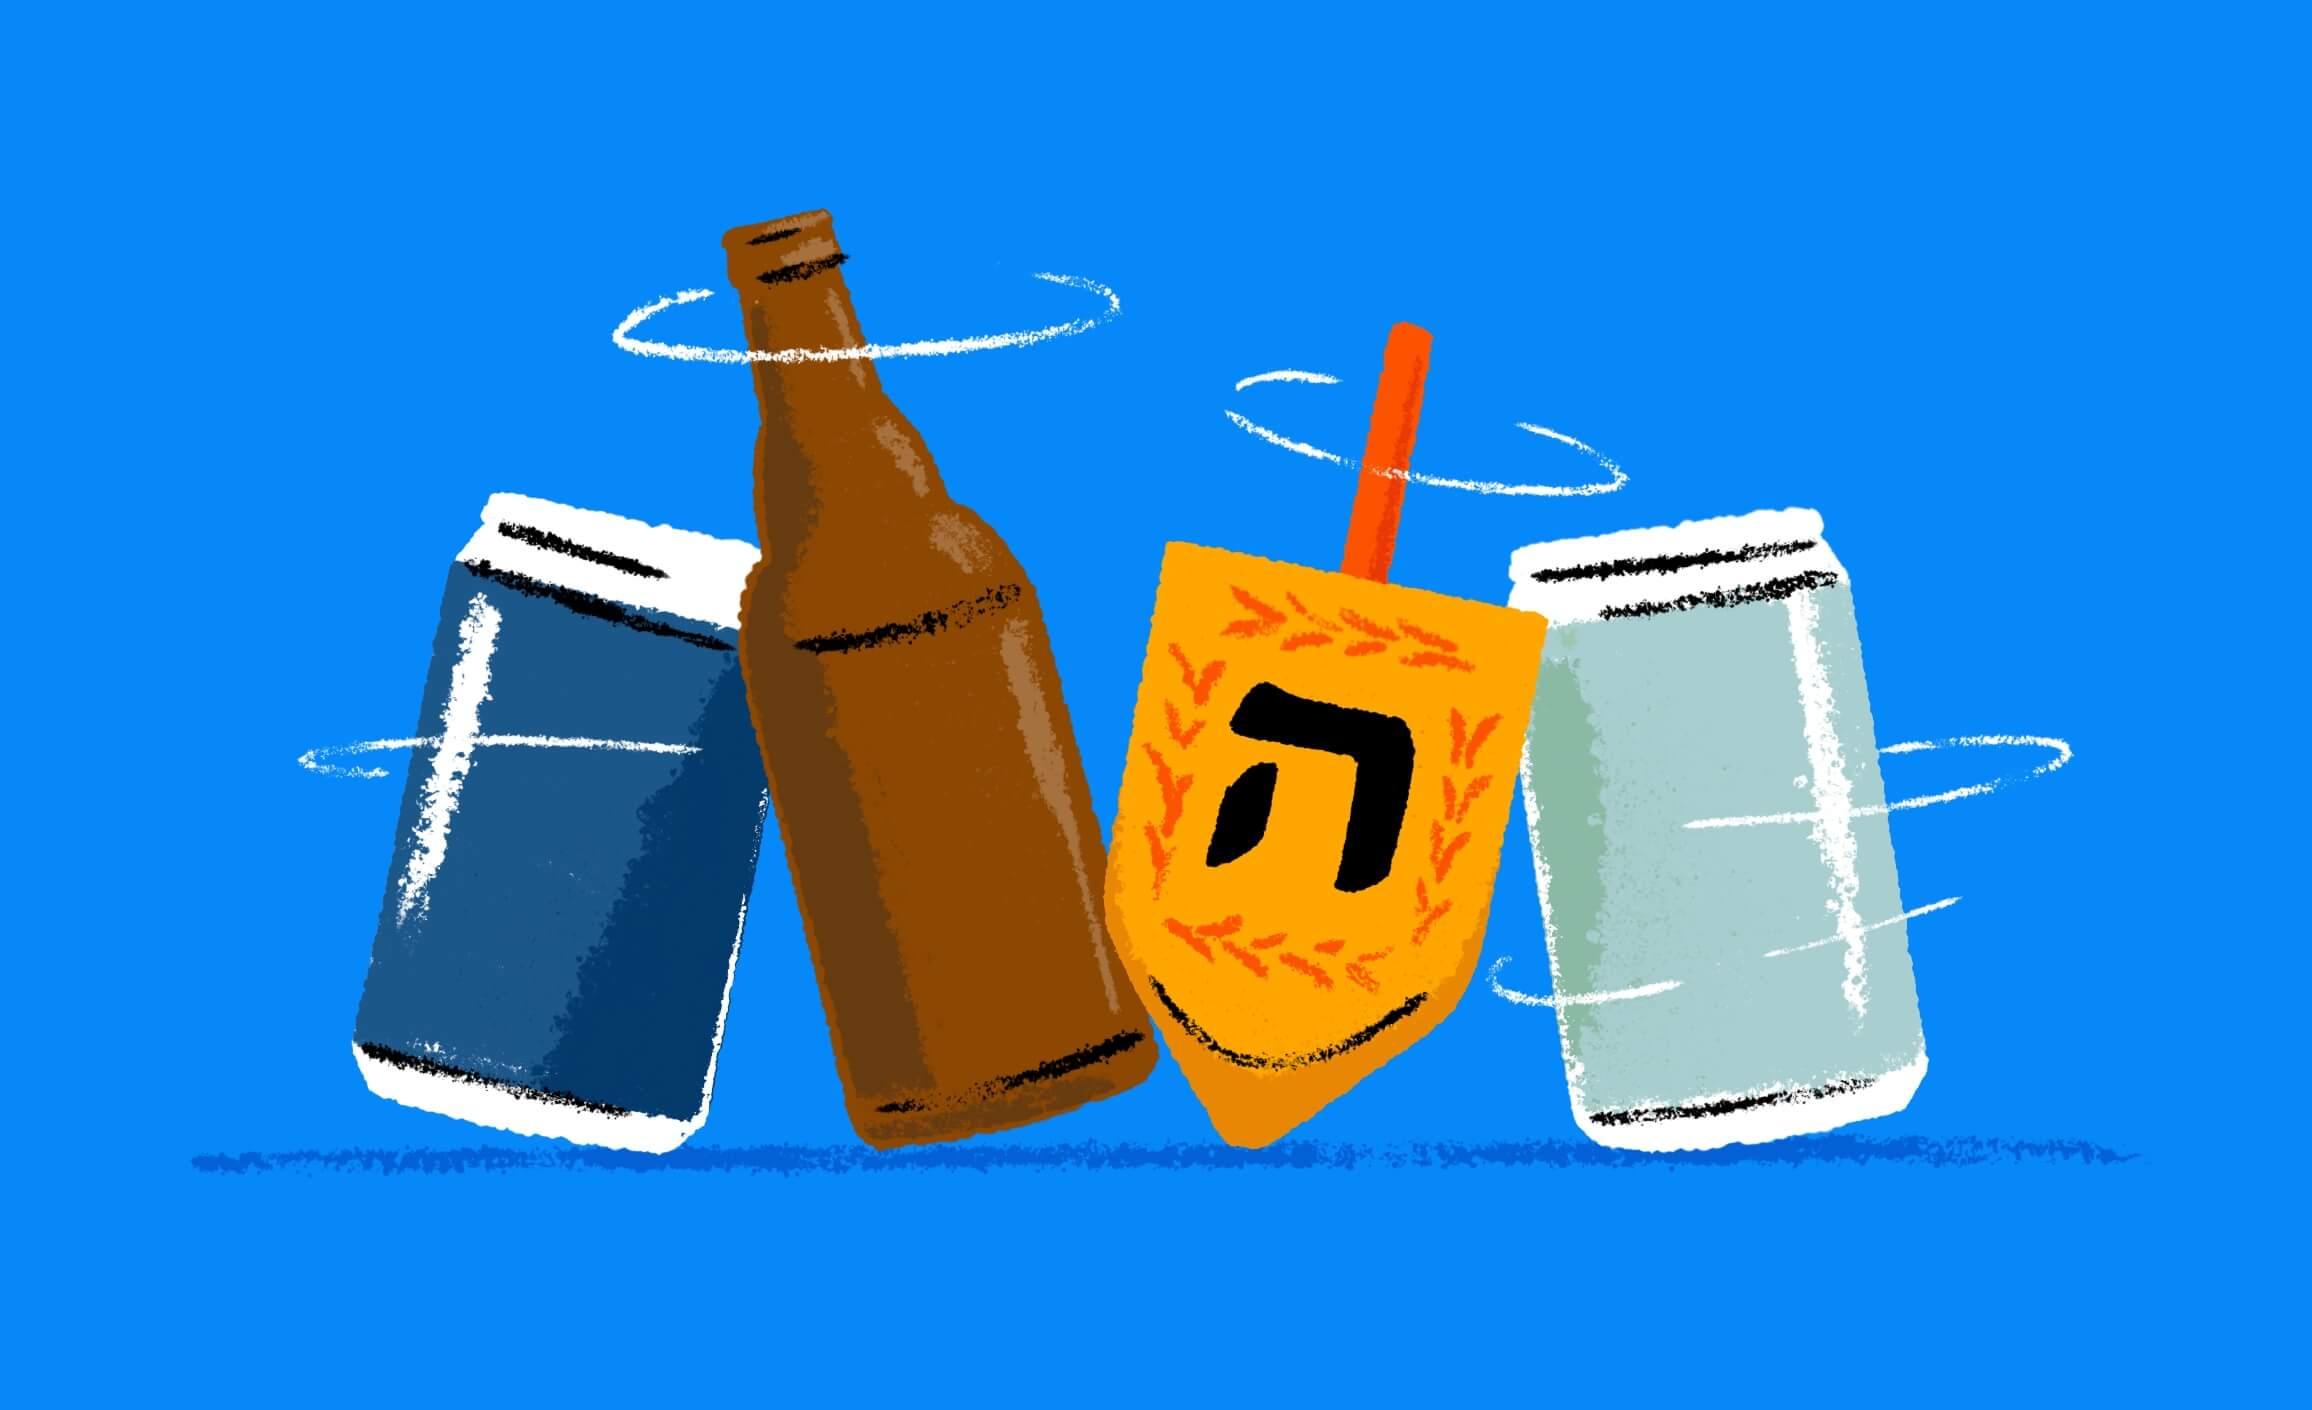 Forget Manischewitz, Hanukkah Should Be All About Beer